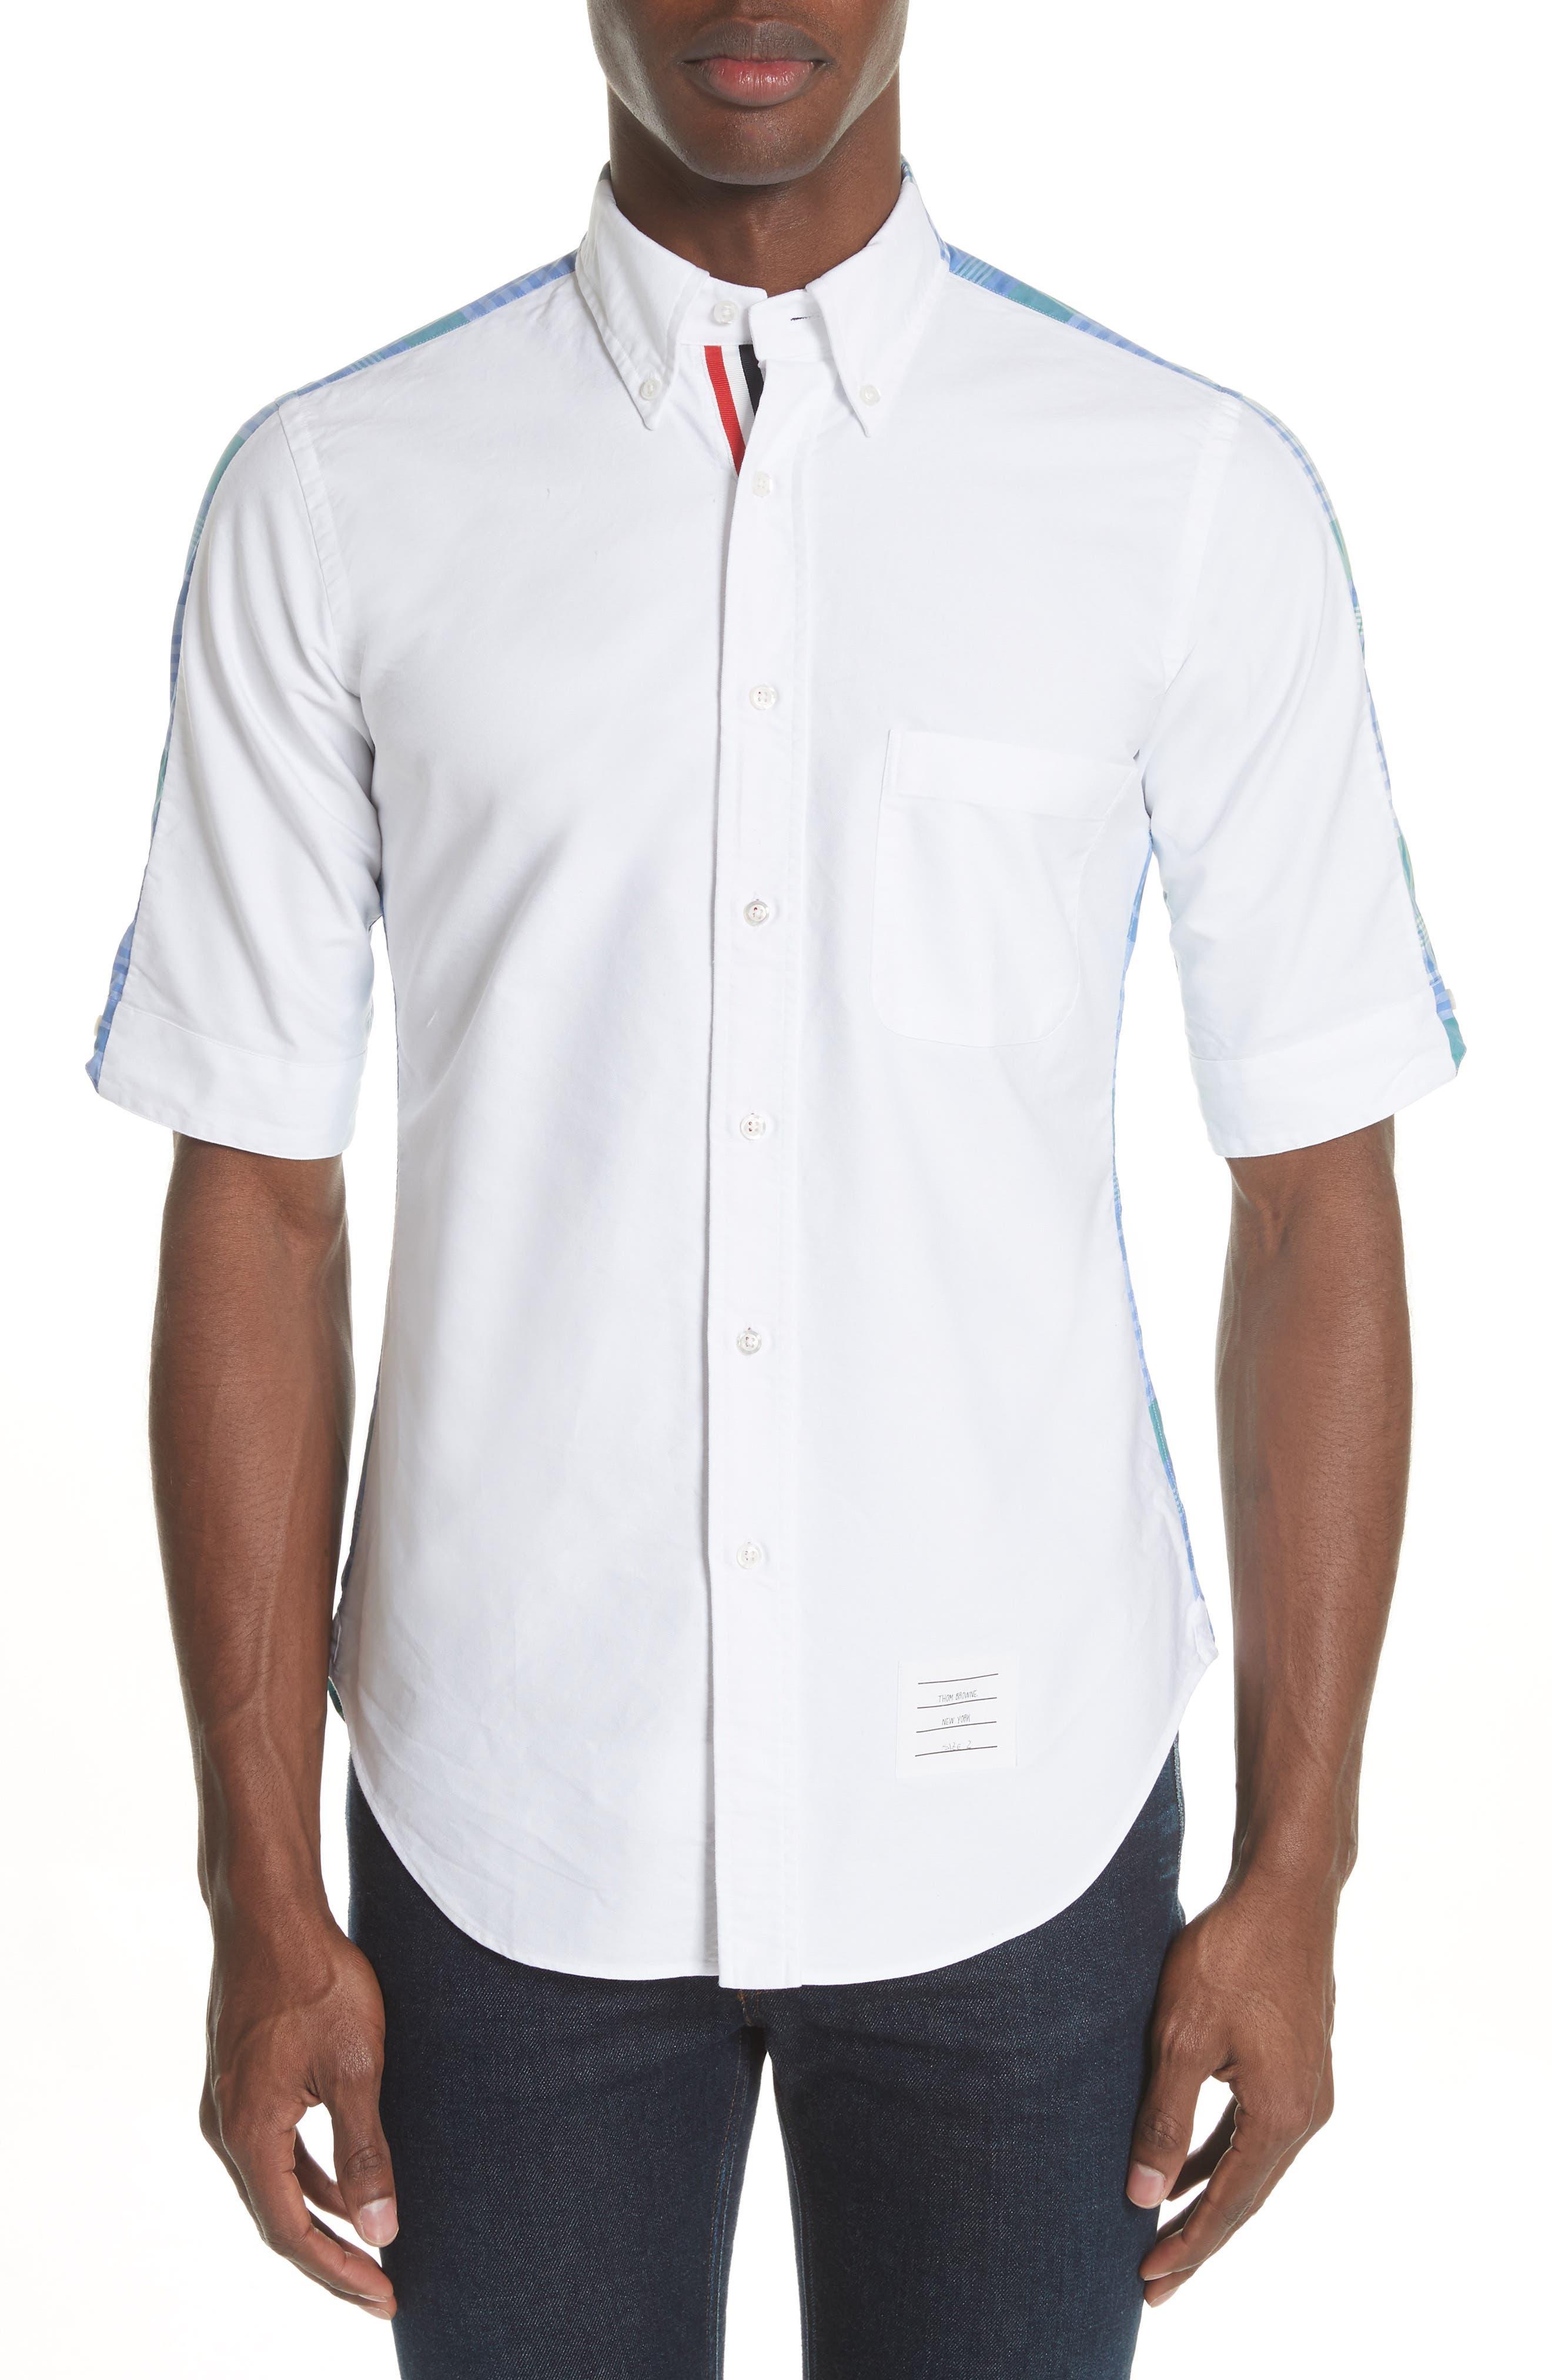 Main Image - Thom Browne Solid & Plaid Woven Shirt